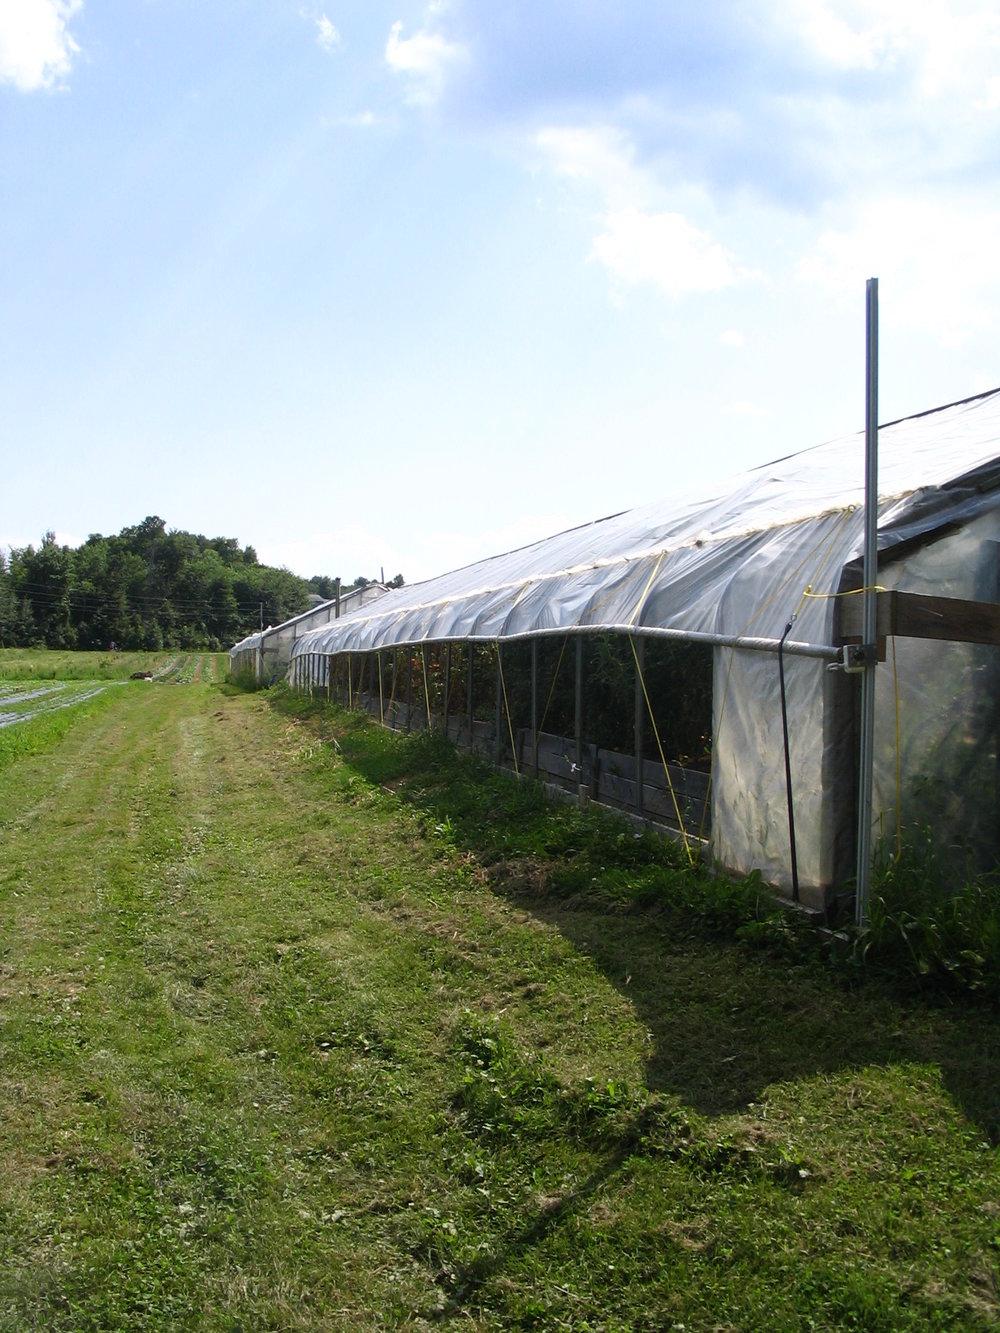 Pomykala Farm